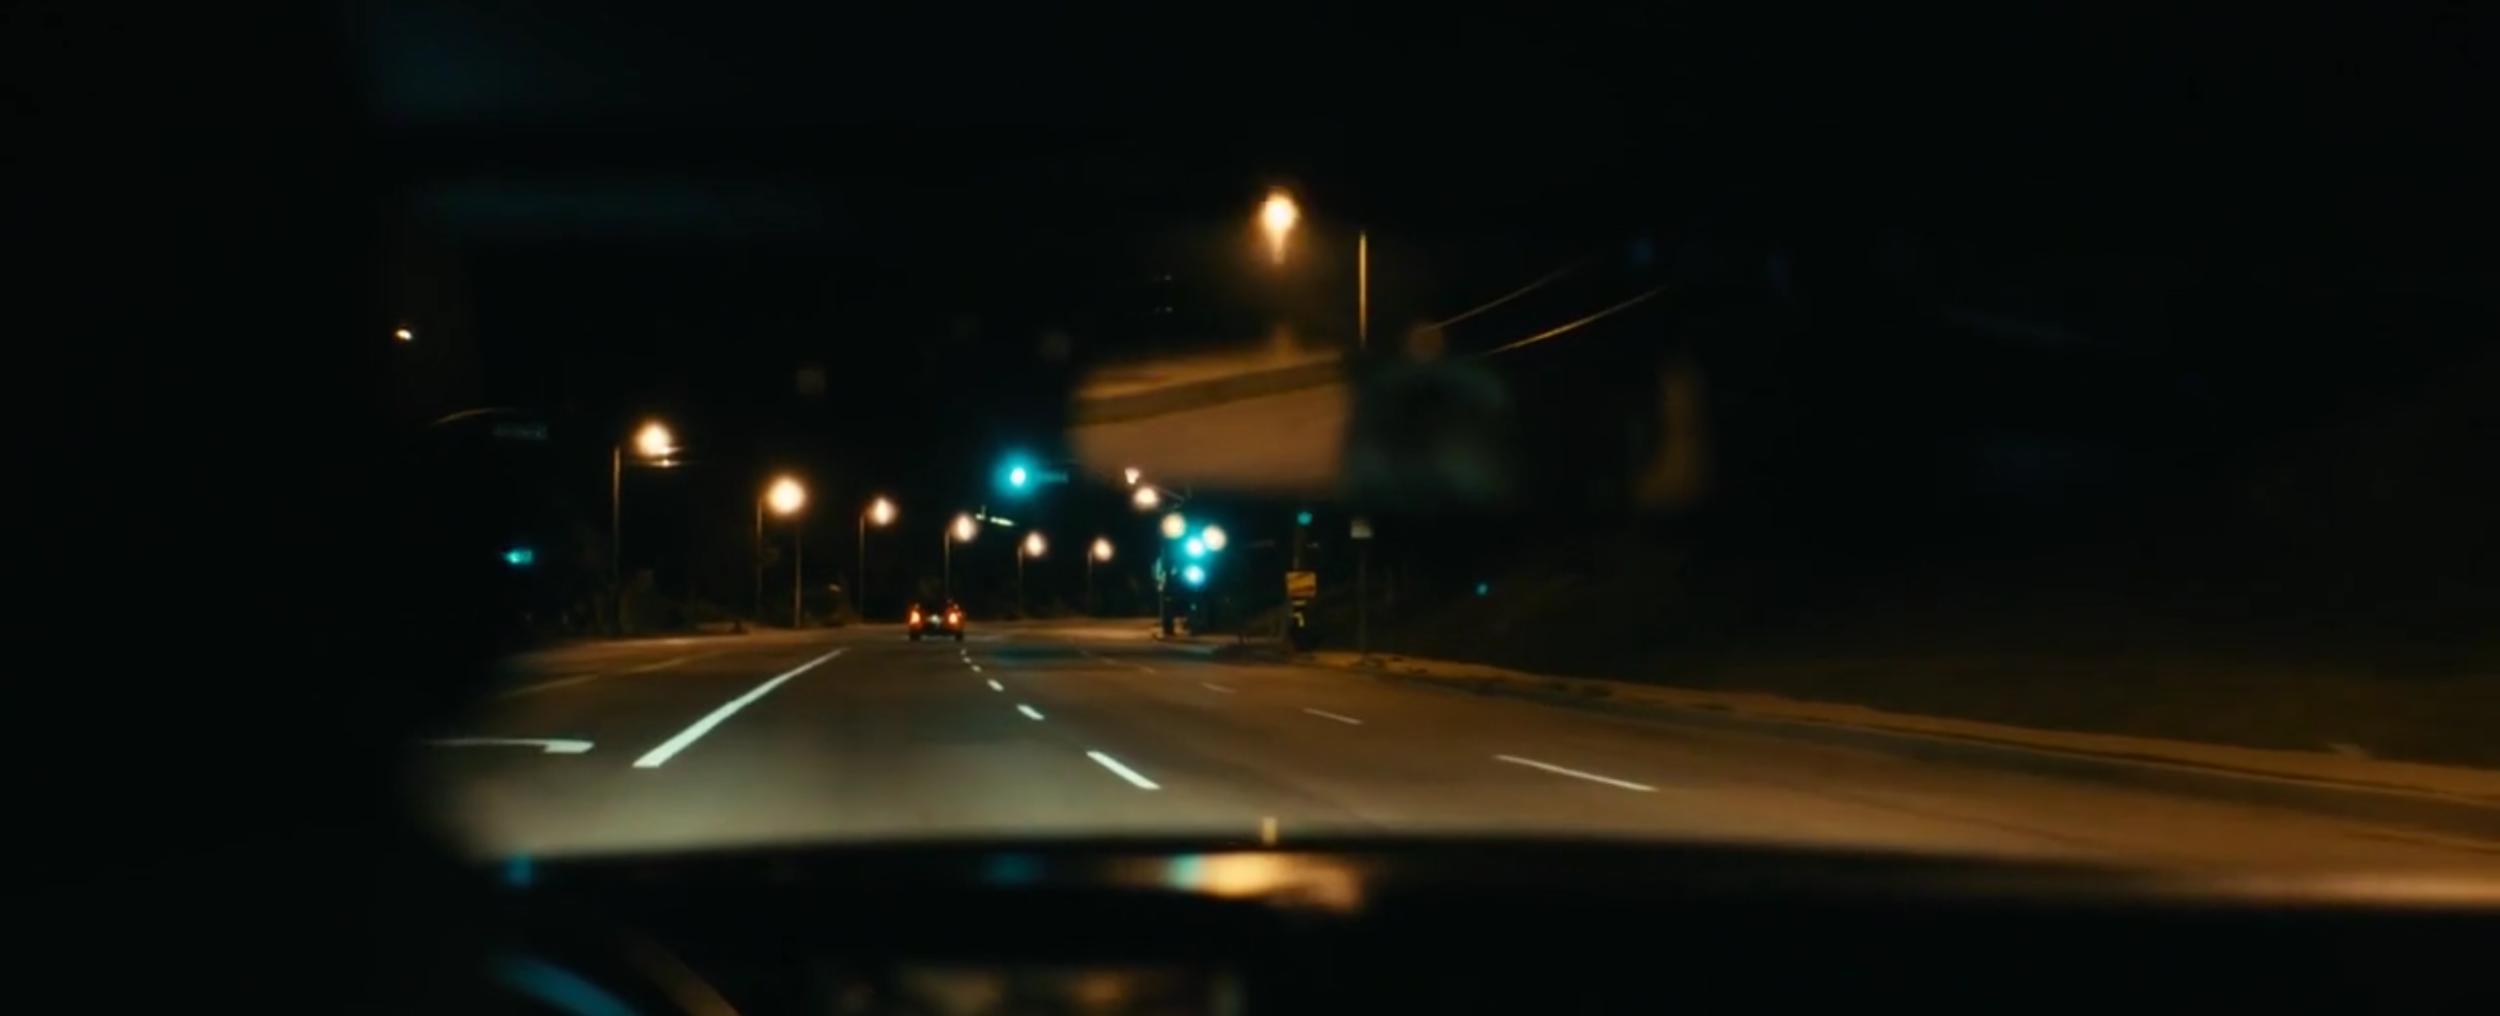 windshield-nightcrawler-01.png